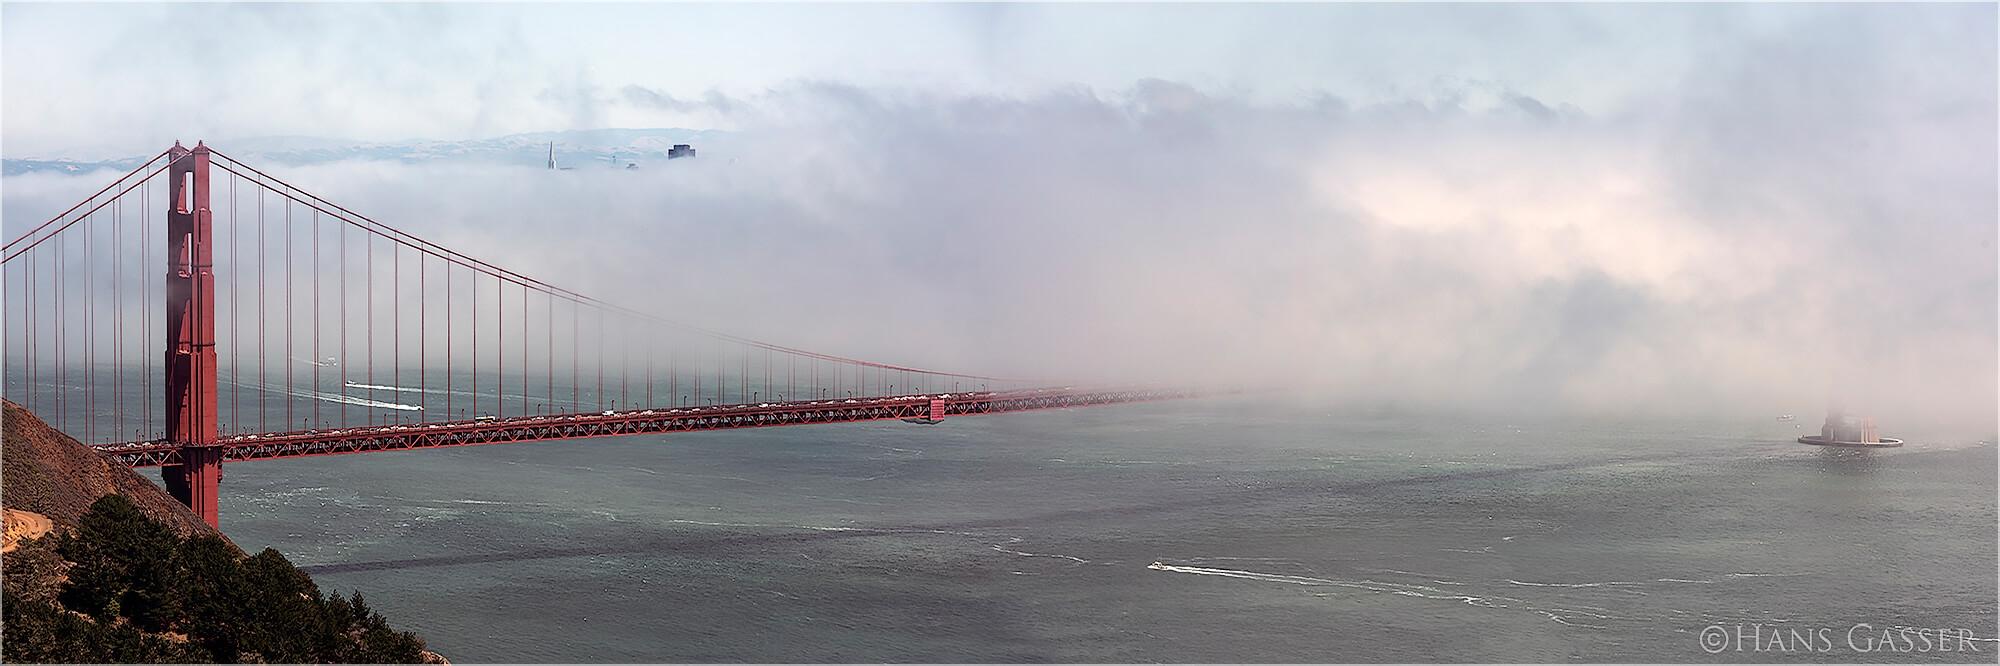 Panoramabild Golden Gate Bridge San Francisco USA